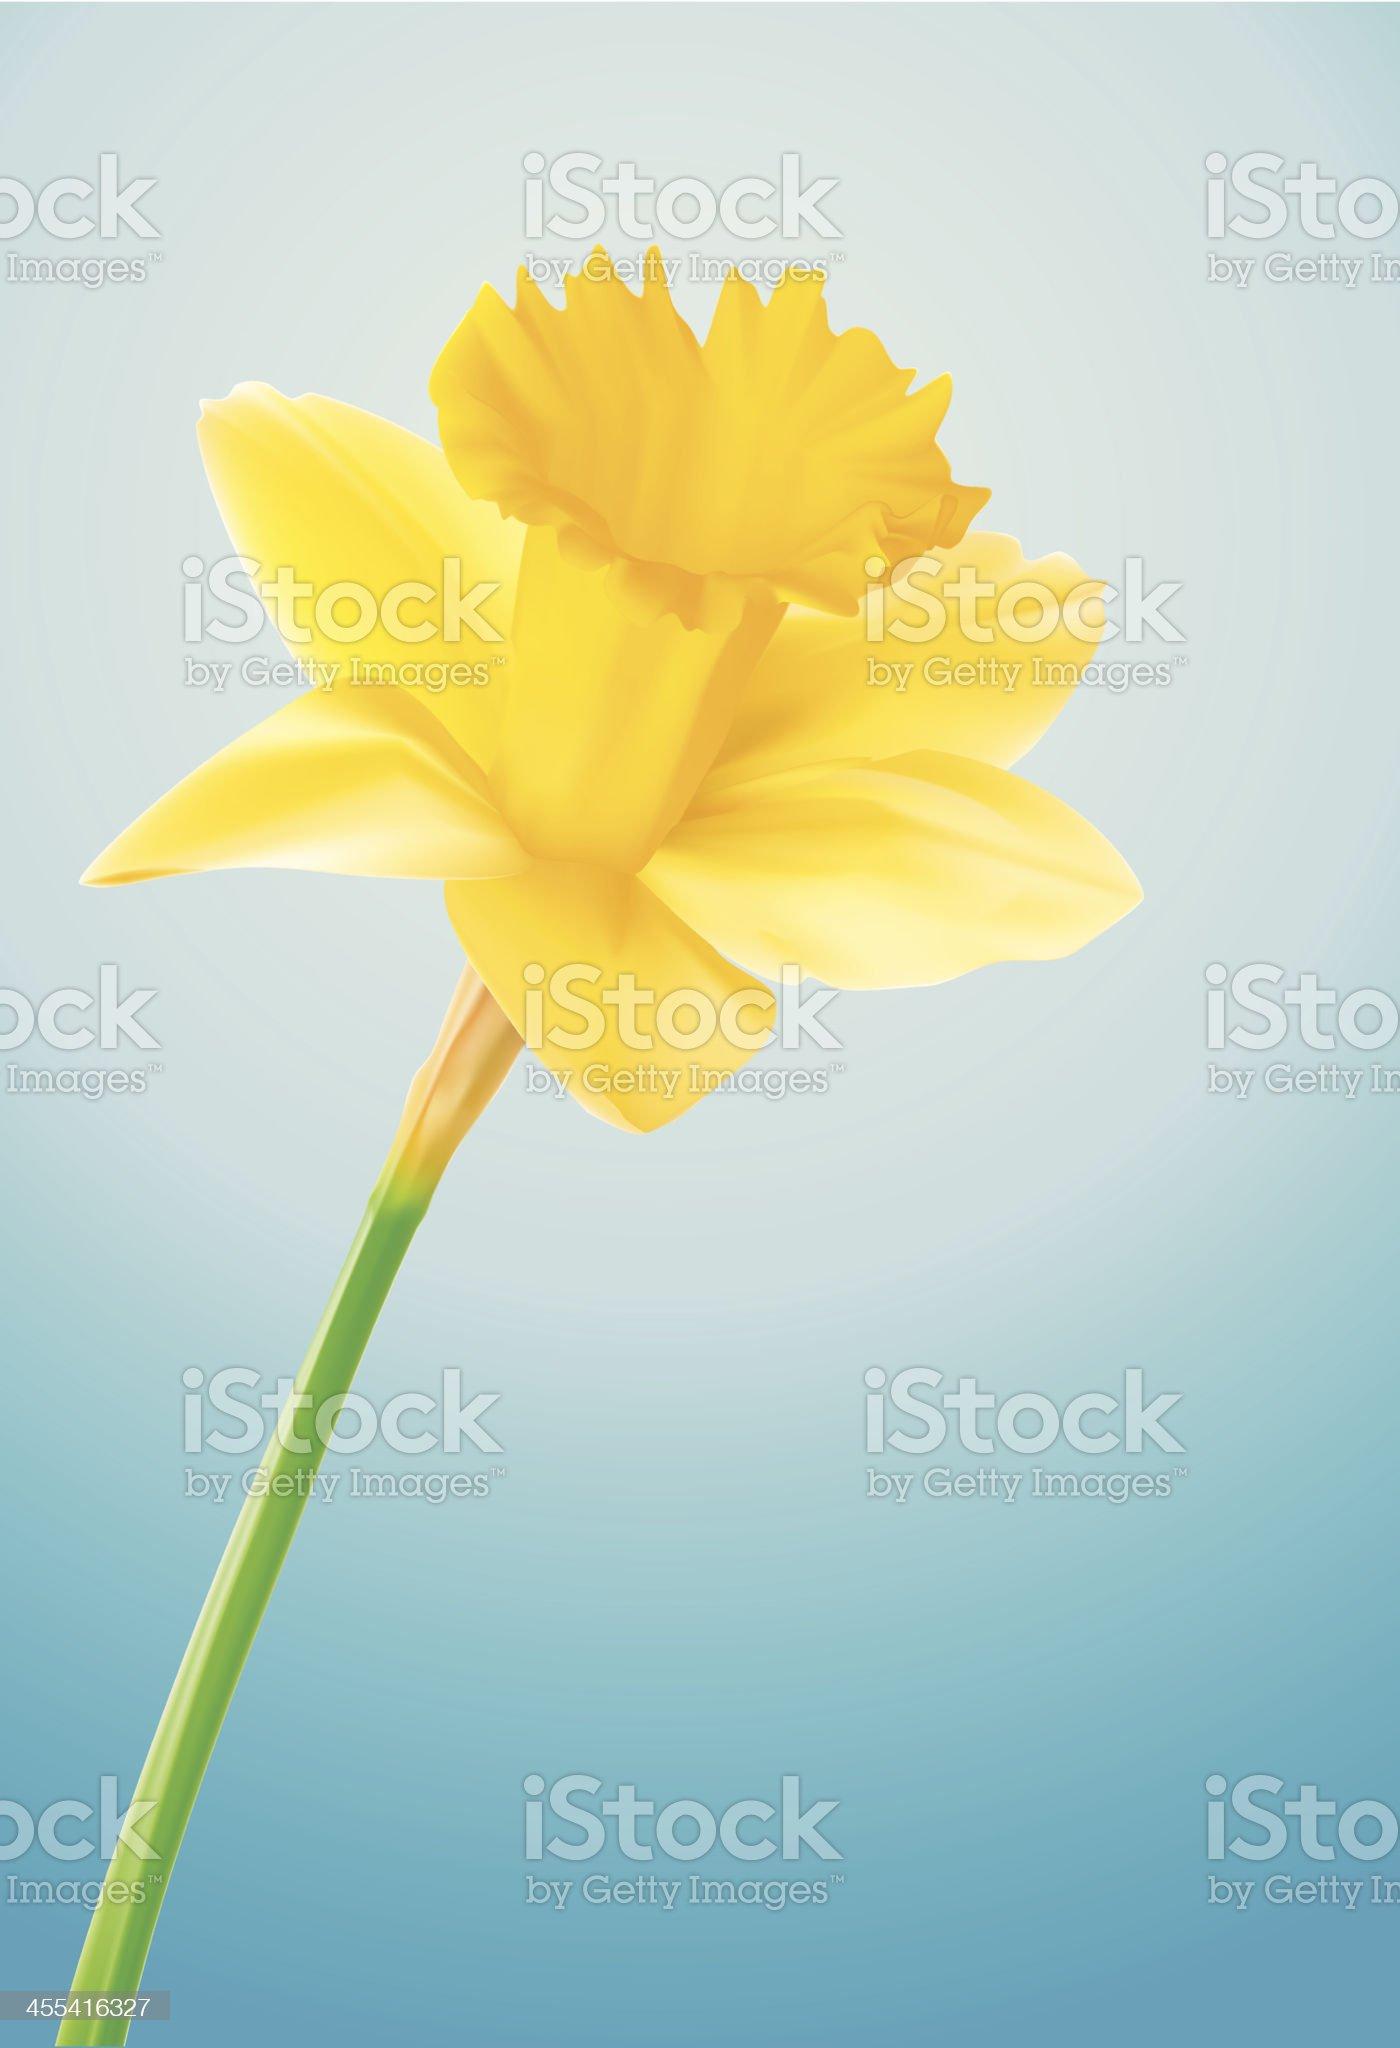 Daffodil - Vector Illustration royalty-free stock vector art